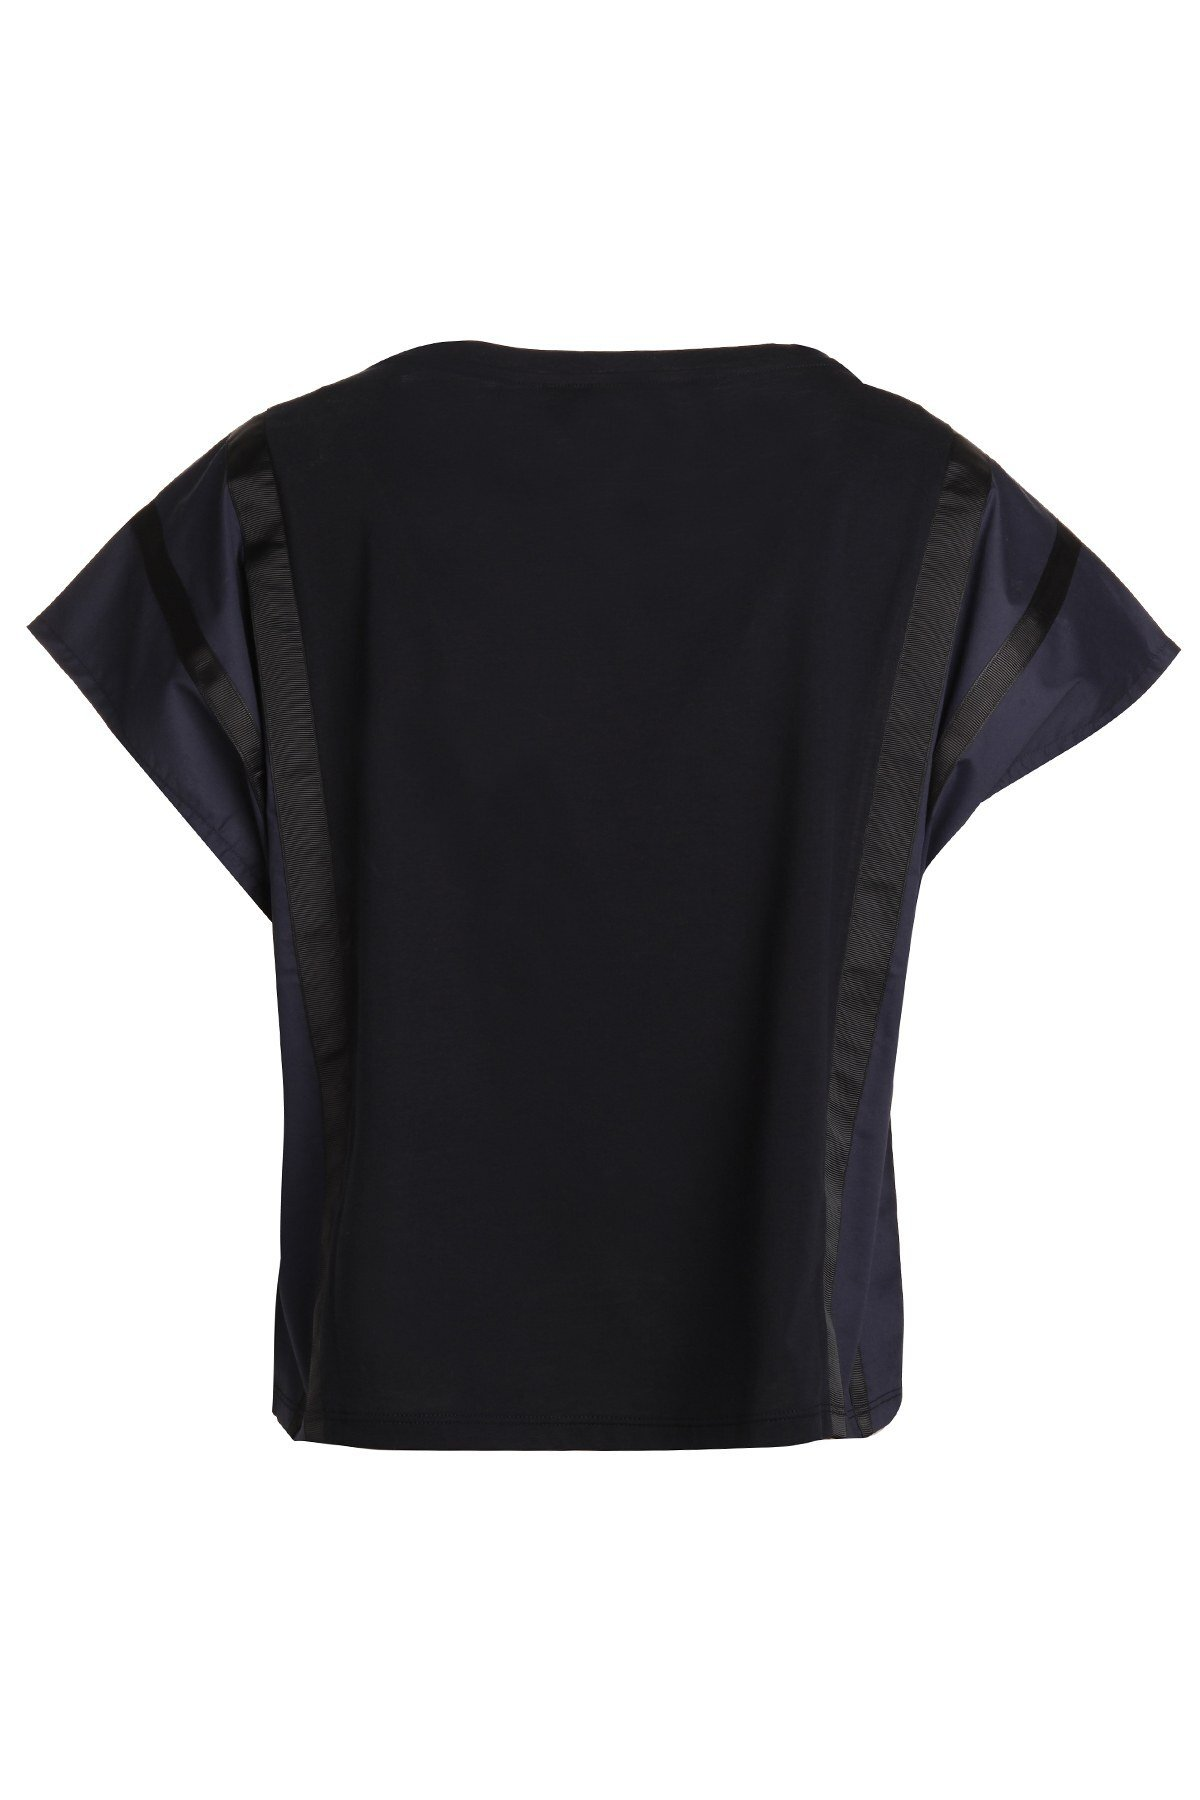 Armani Jeans Kadın T Shirt 3Y5M655JXAZ